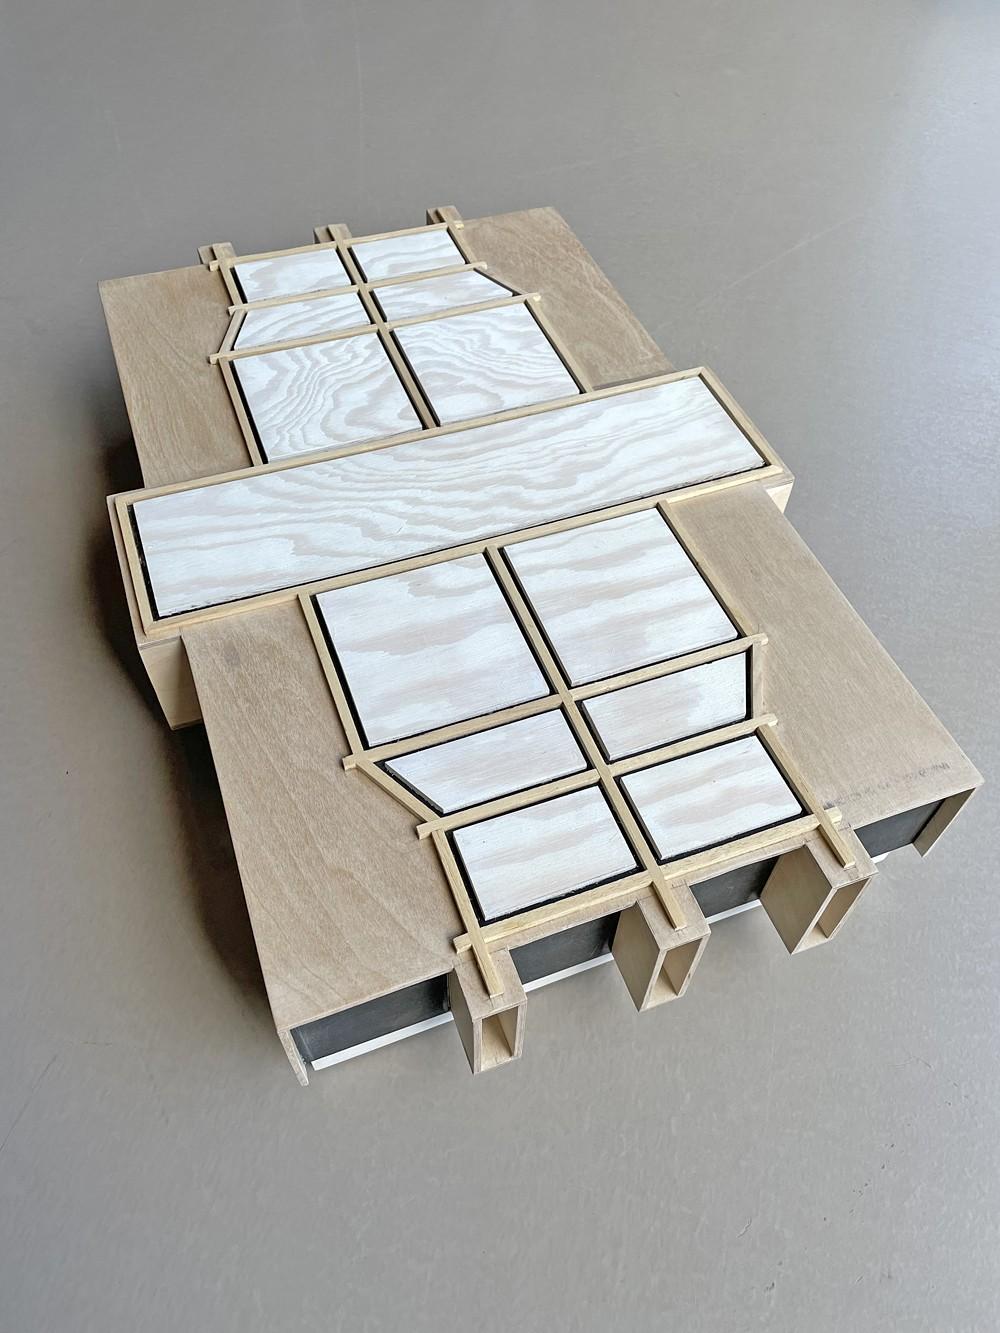 Studio-Frank-Havermans-Liber-Amicorum-Box-ZIN_7